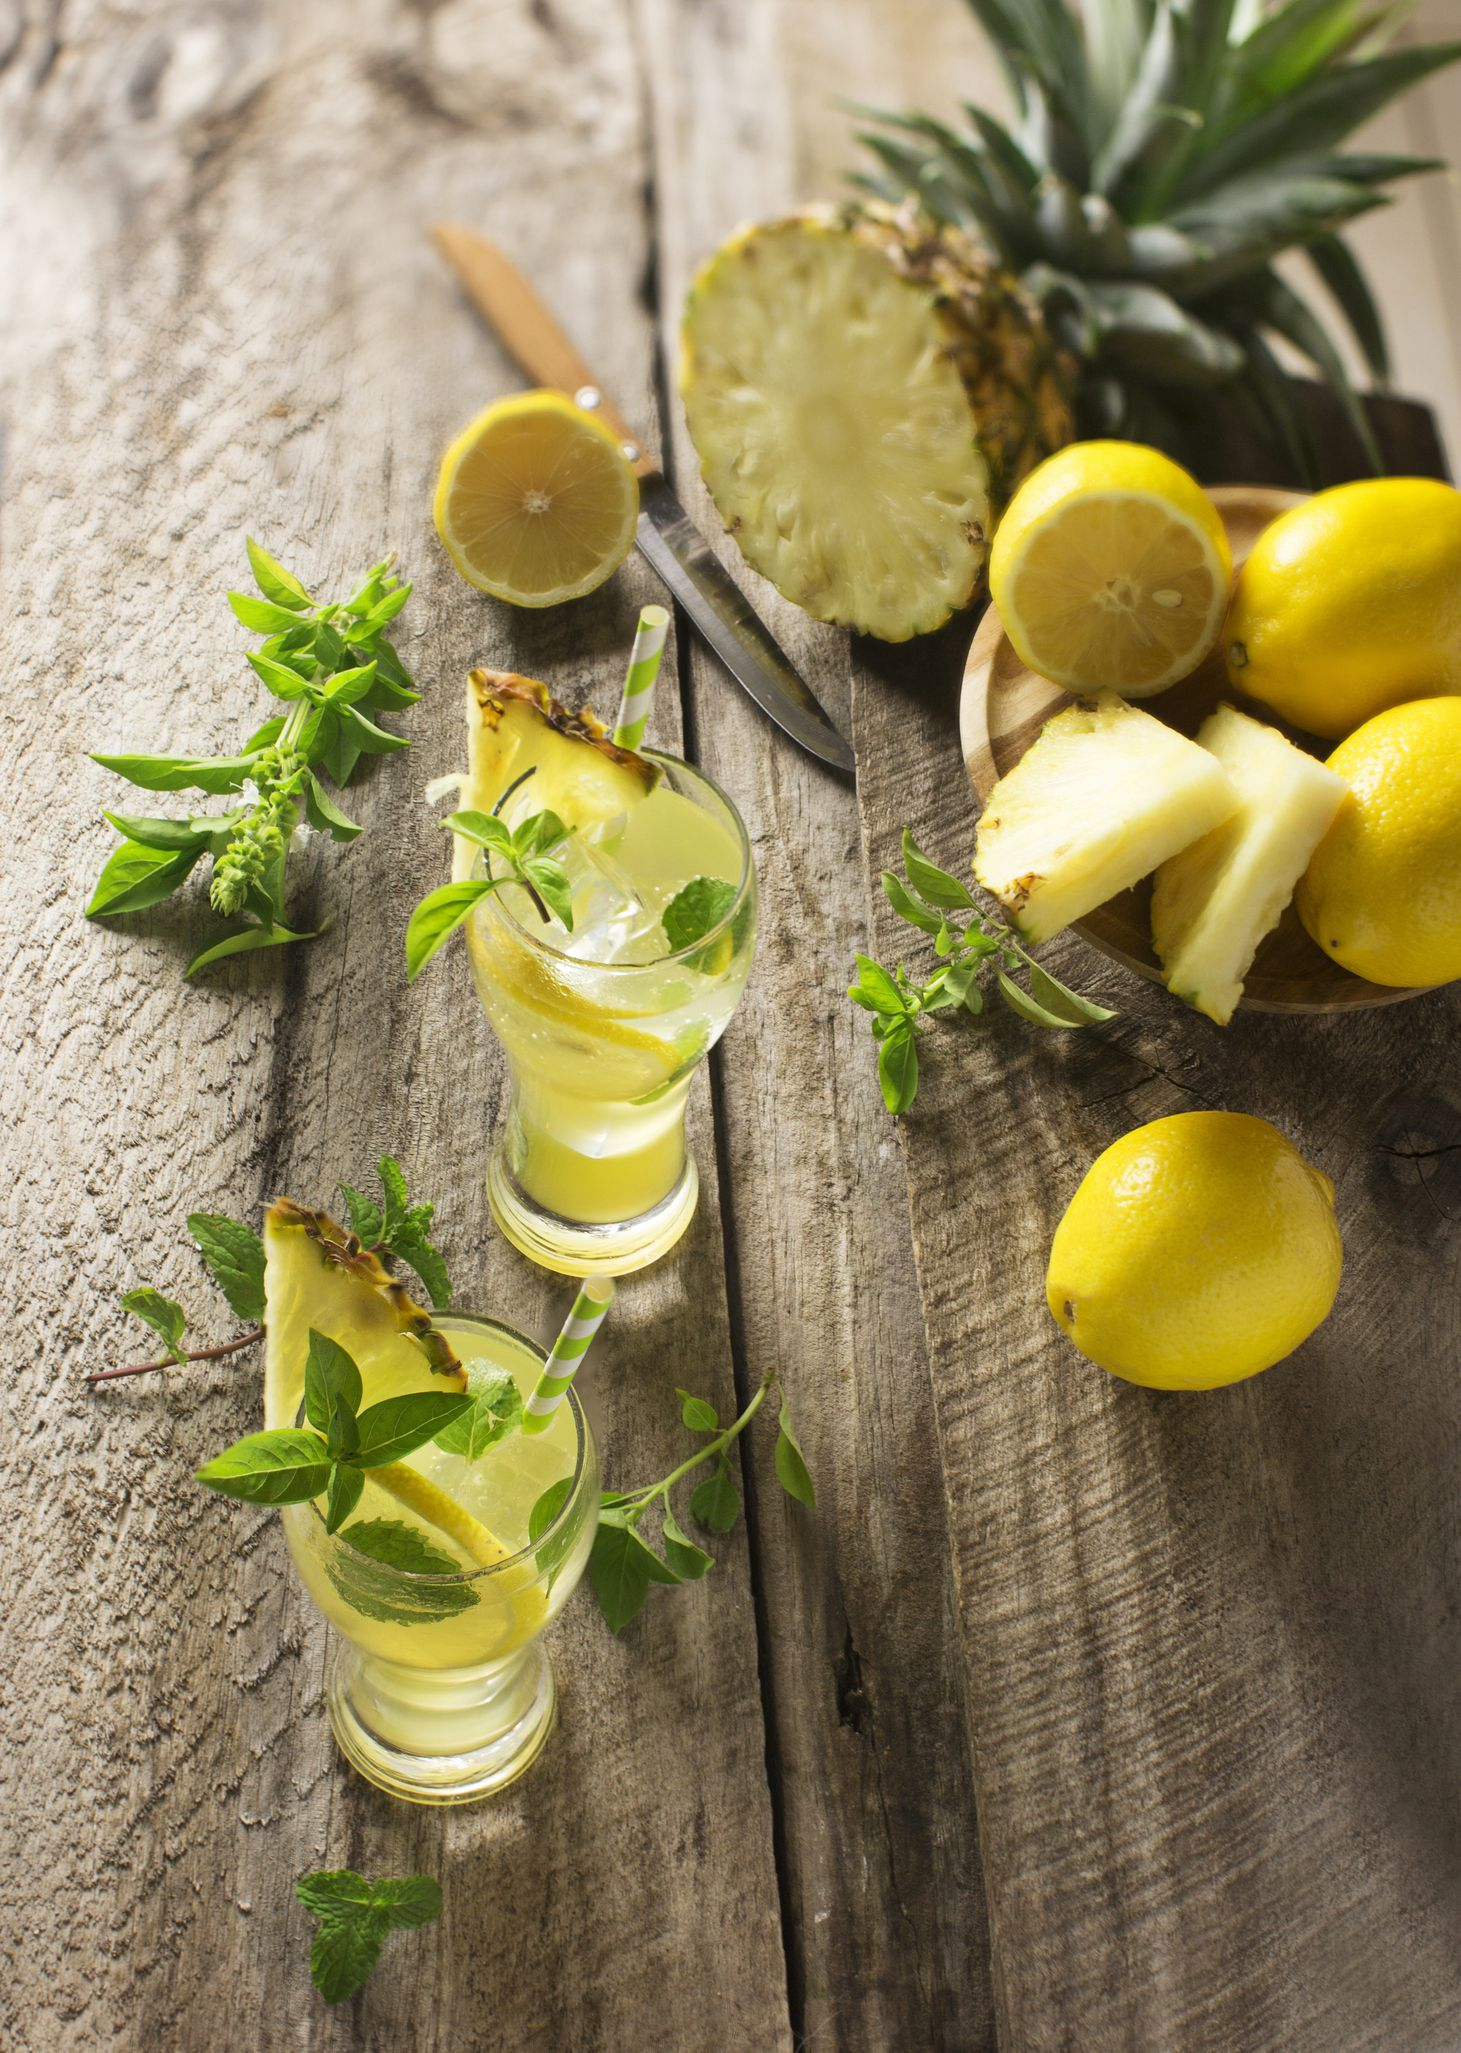 Pineapple Coconut Water Lime Amp Mint Detox Tonic Recipe